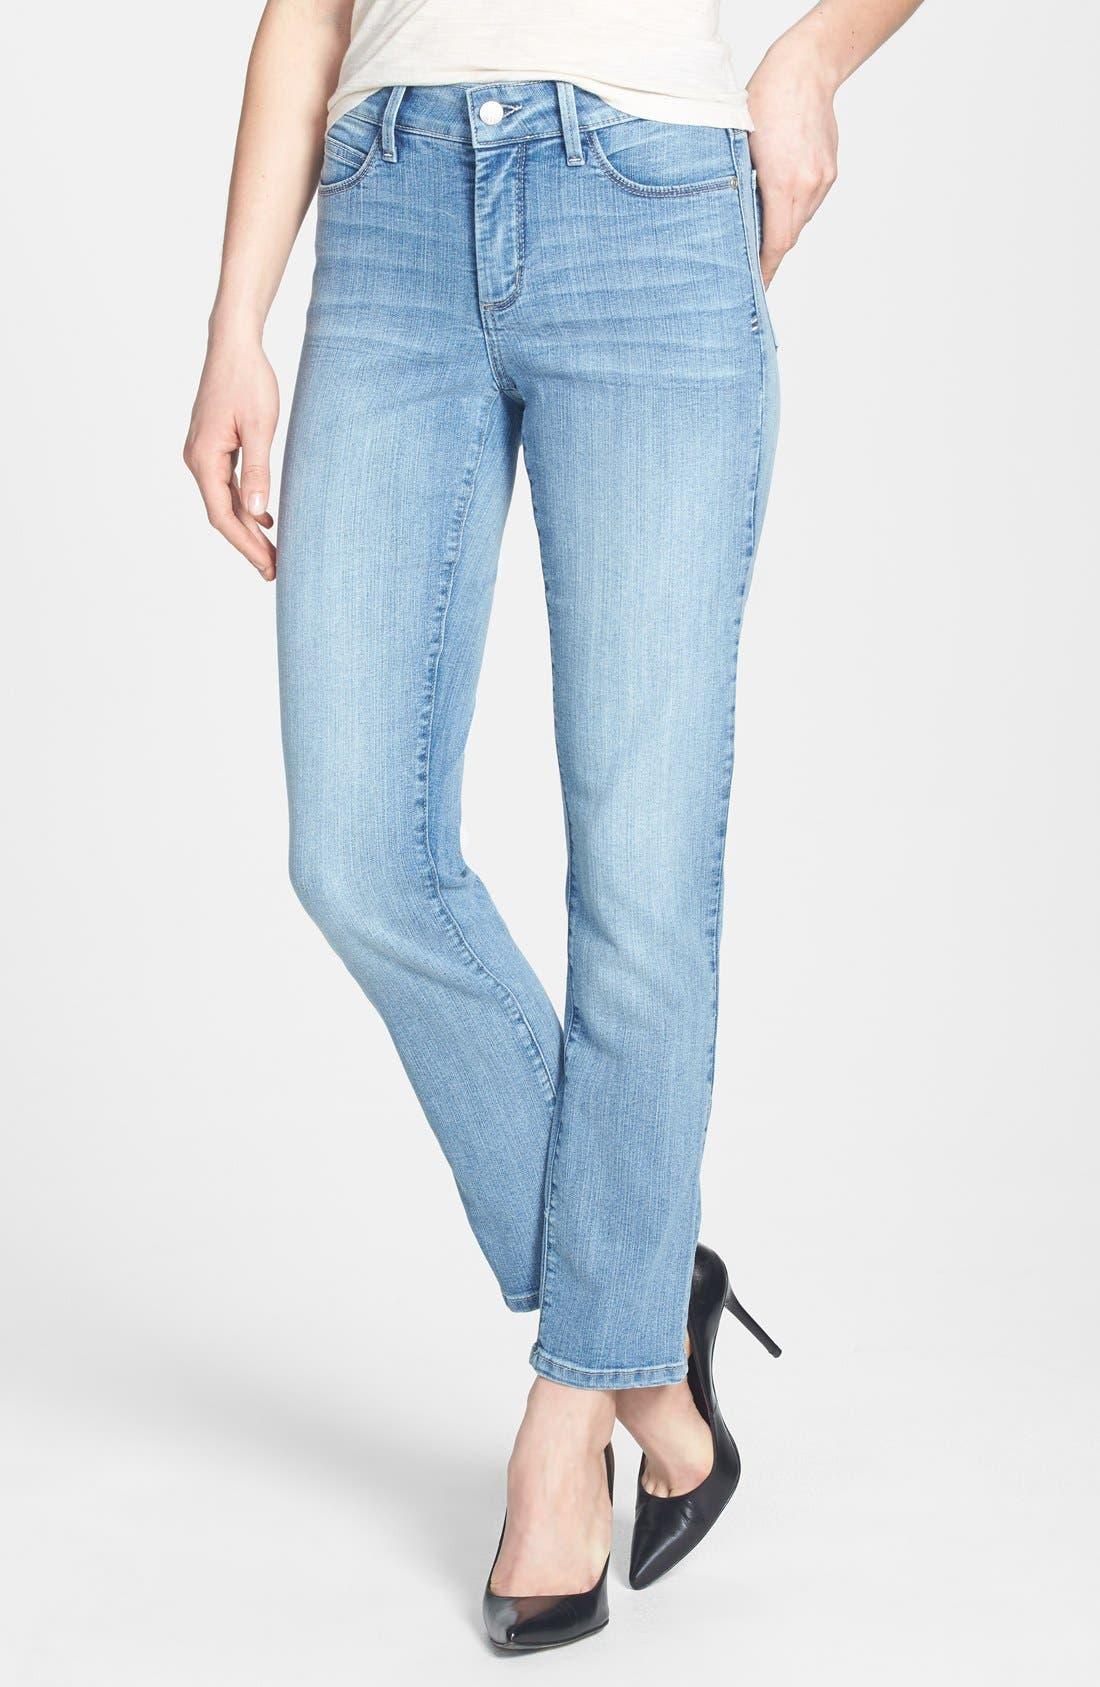 Main Image - NYDJ 'Bobbie' Stretch Boyfriend Jeans (Aruba) (Regular & Petite)